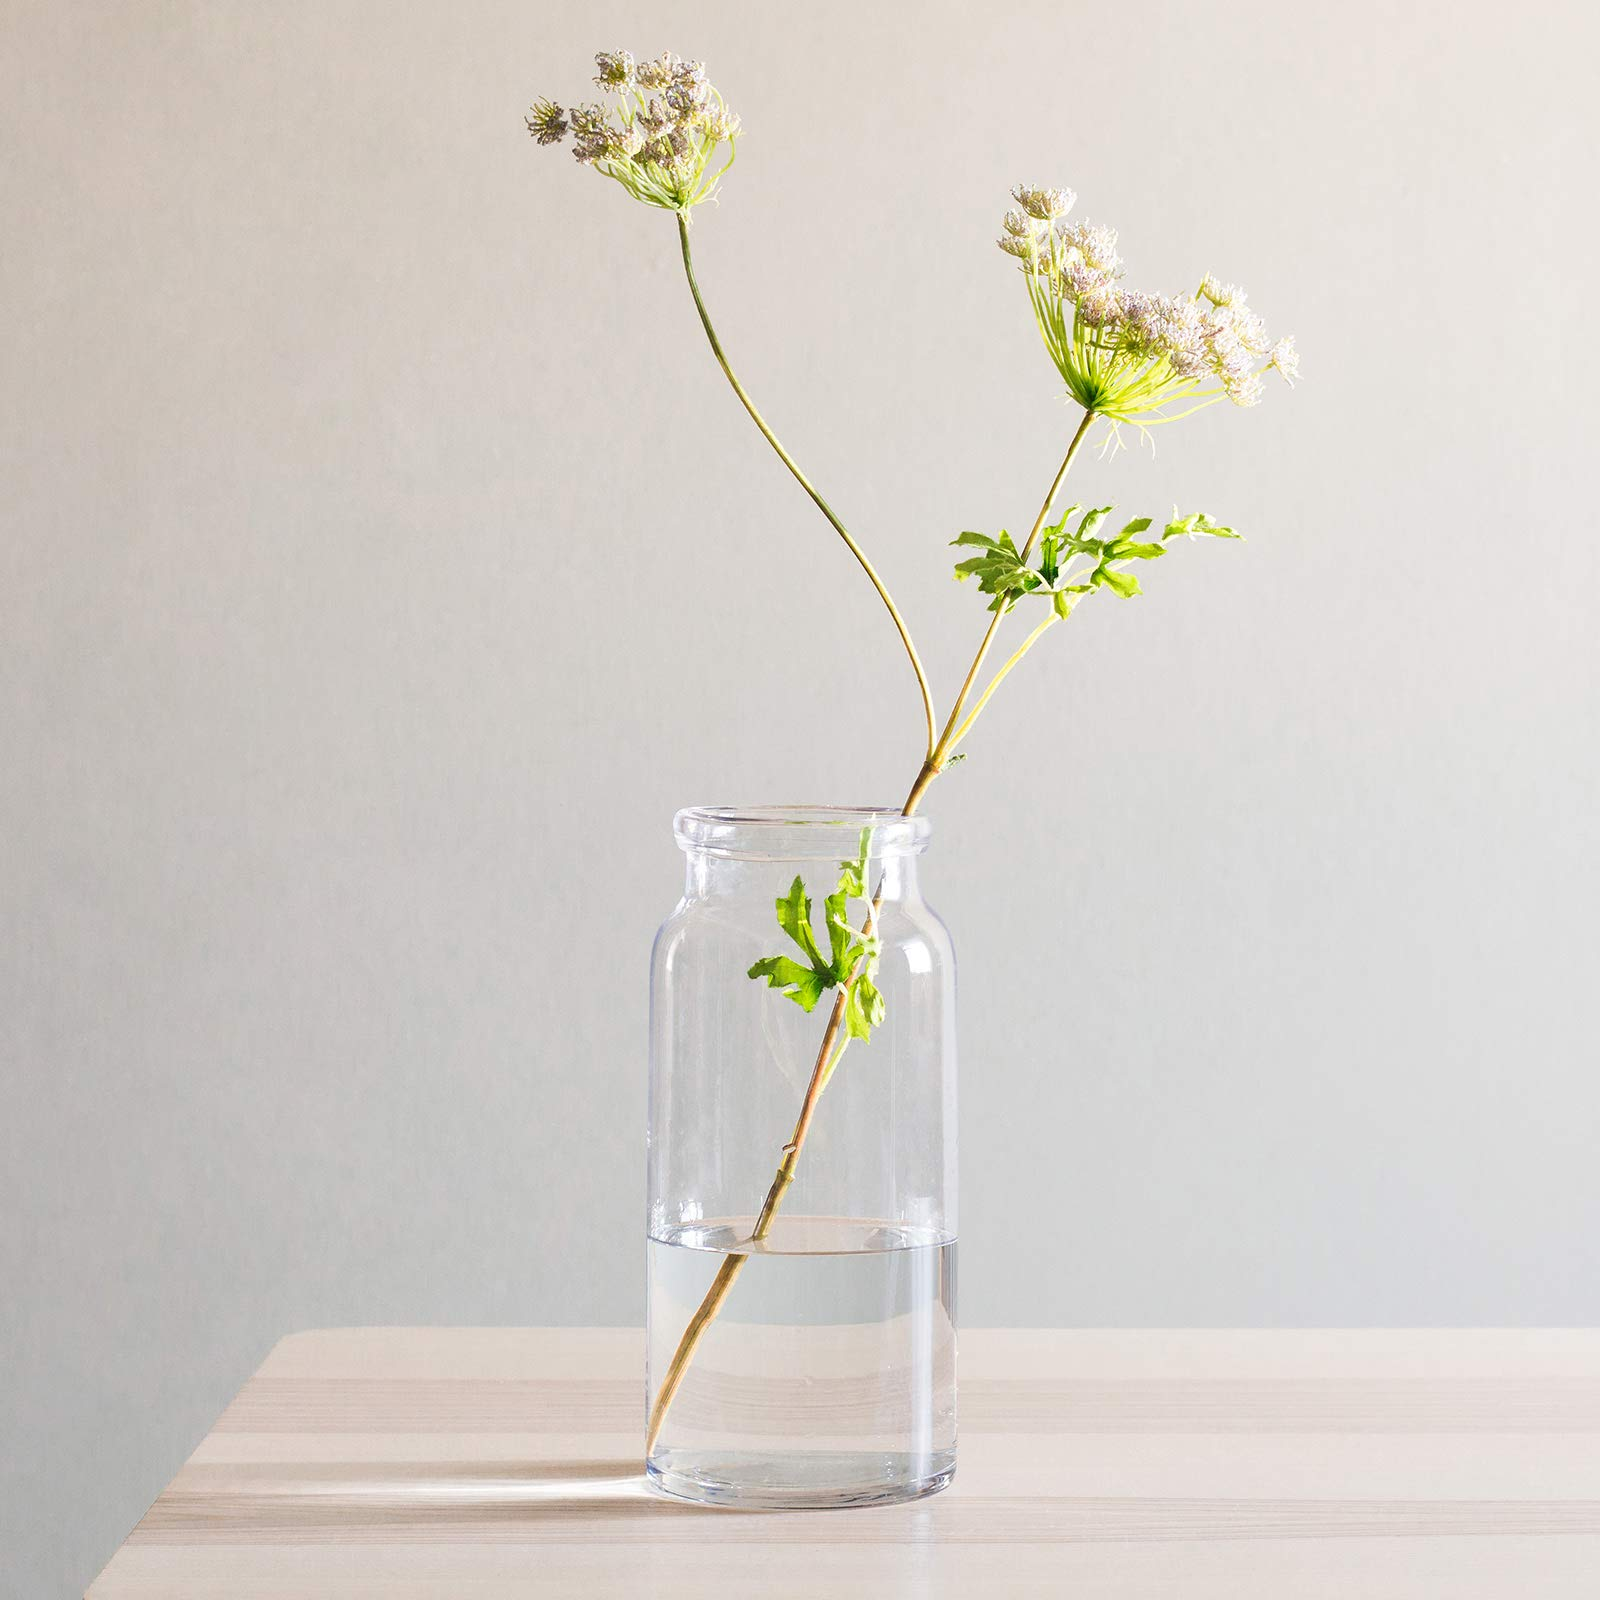 CASAMOTION Vases Hand Blown Art Glass Vase, Centerpiece Vases for Table, Clear, 12''